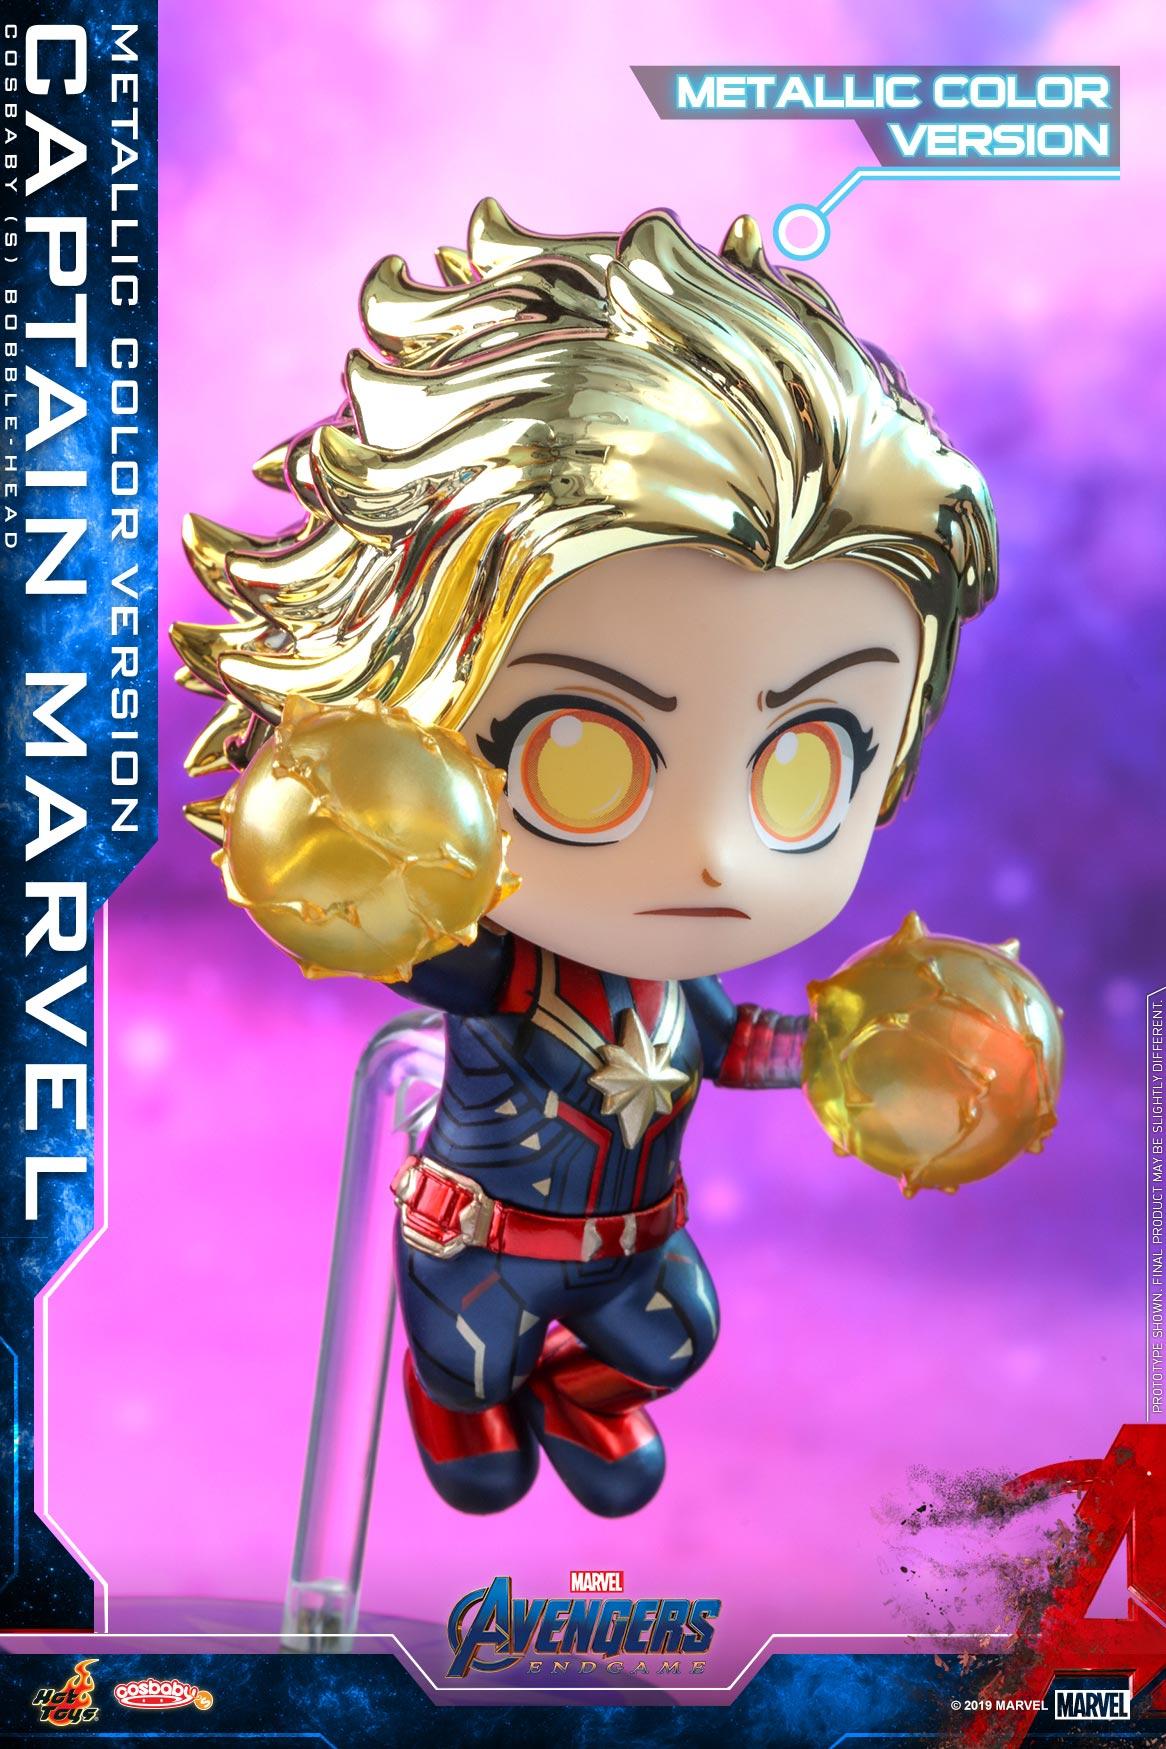 Hot-Toys---A4---Captain-Marvel-(Metallic-Color-Version)-Cosbaby-(S)_PR2